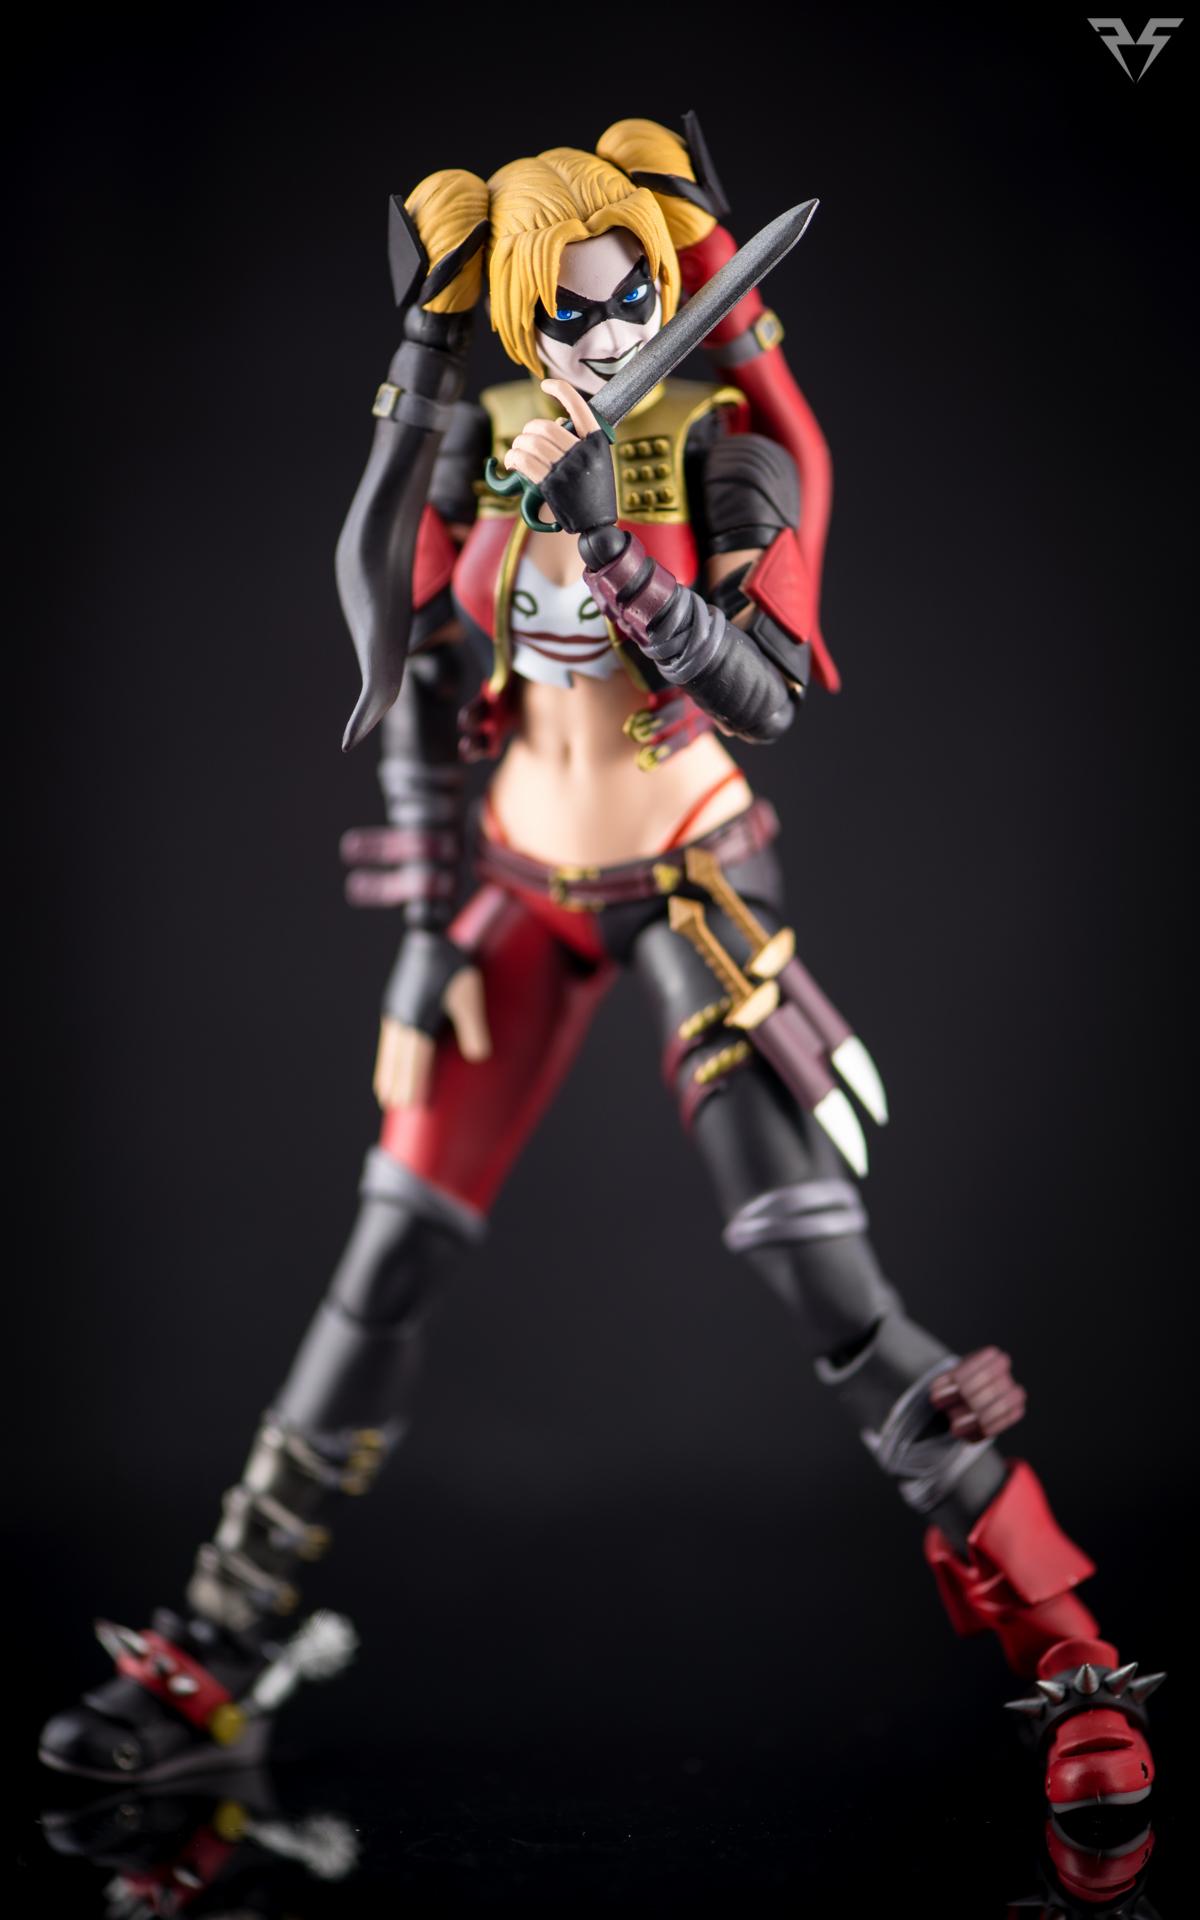 Figuarts Harley Quinn-23.jpg